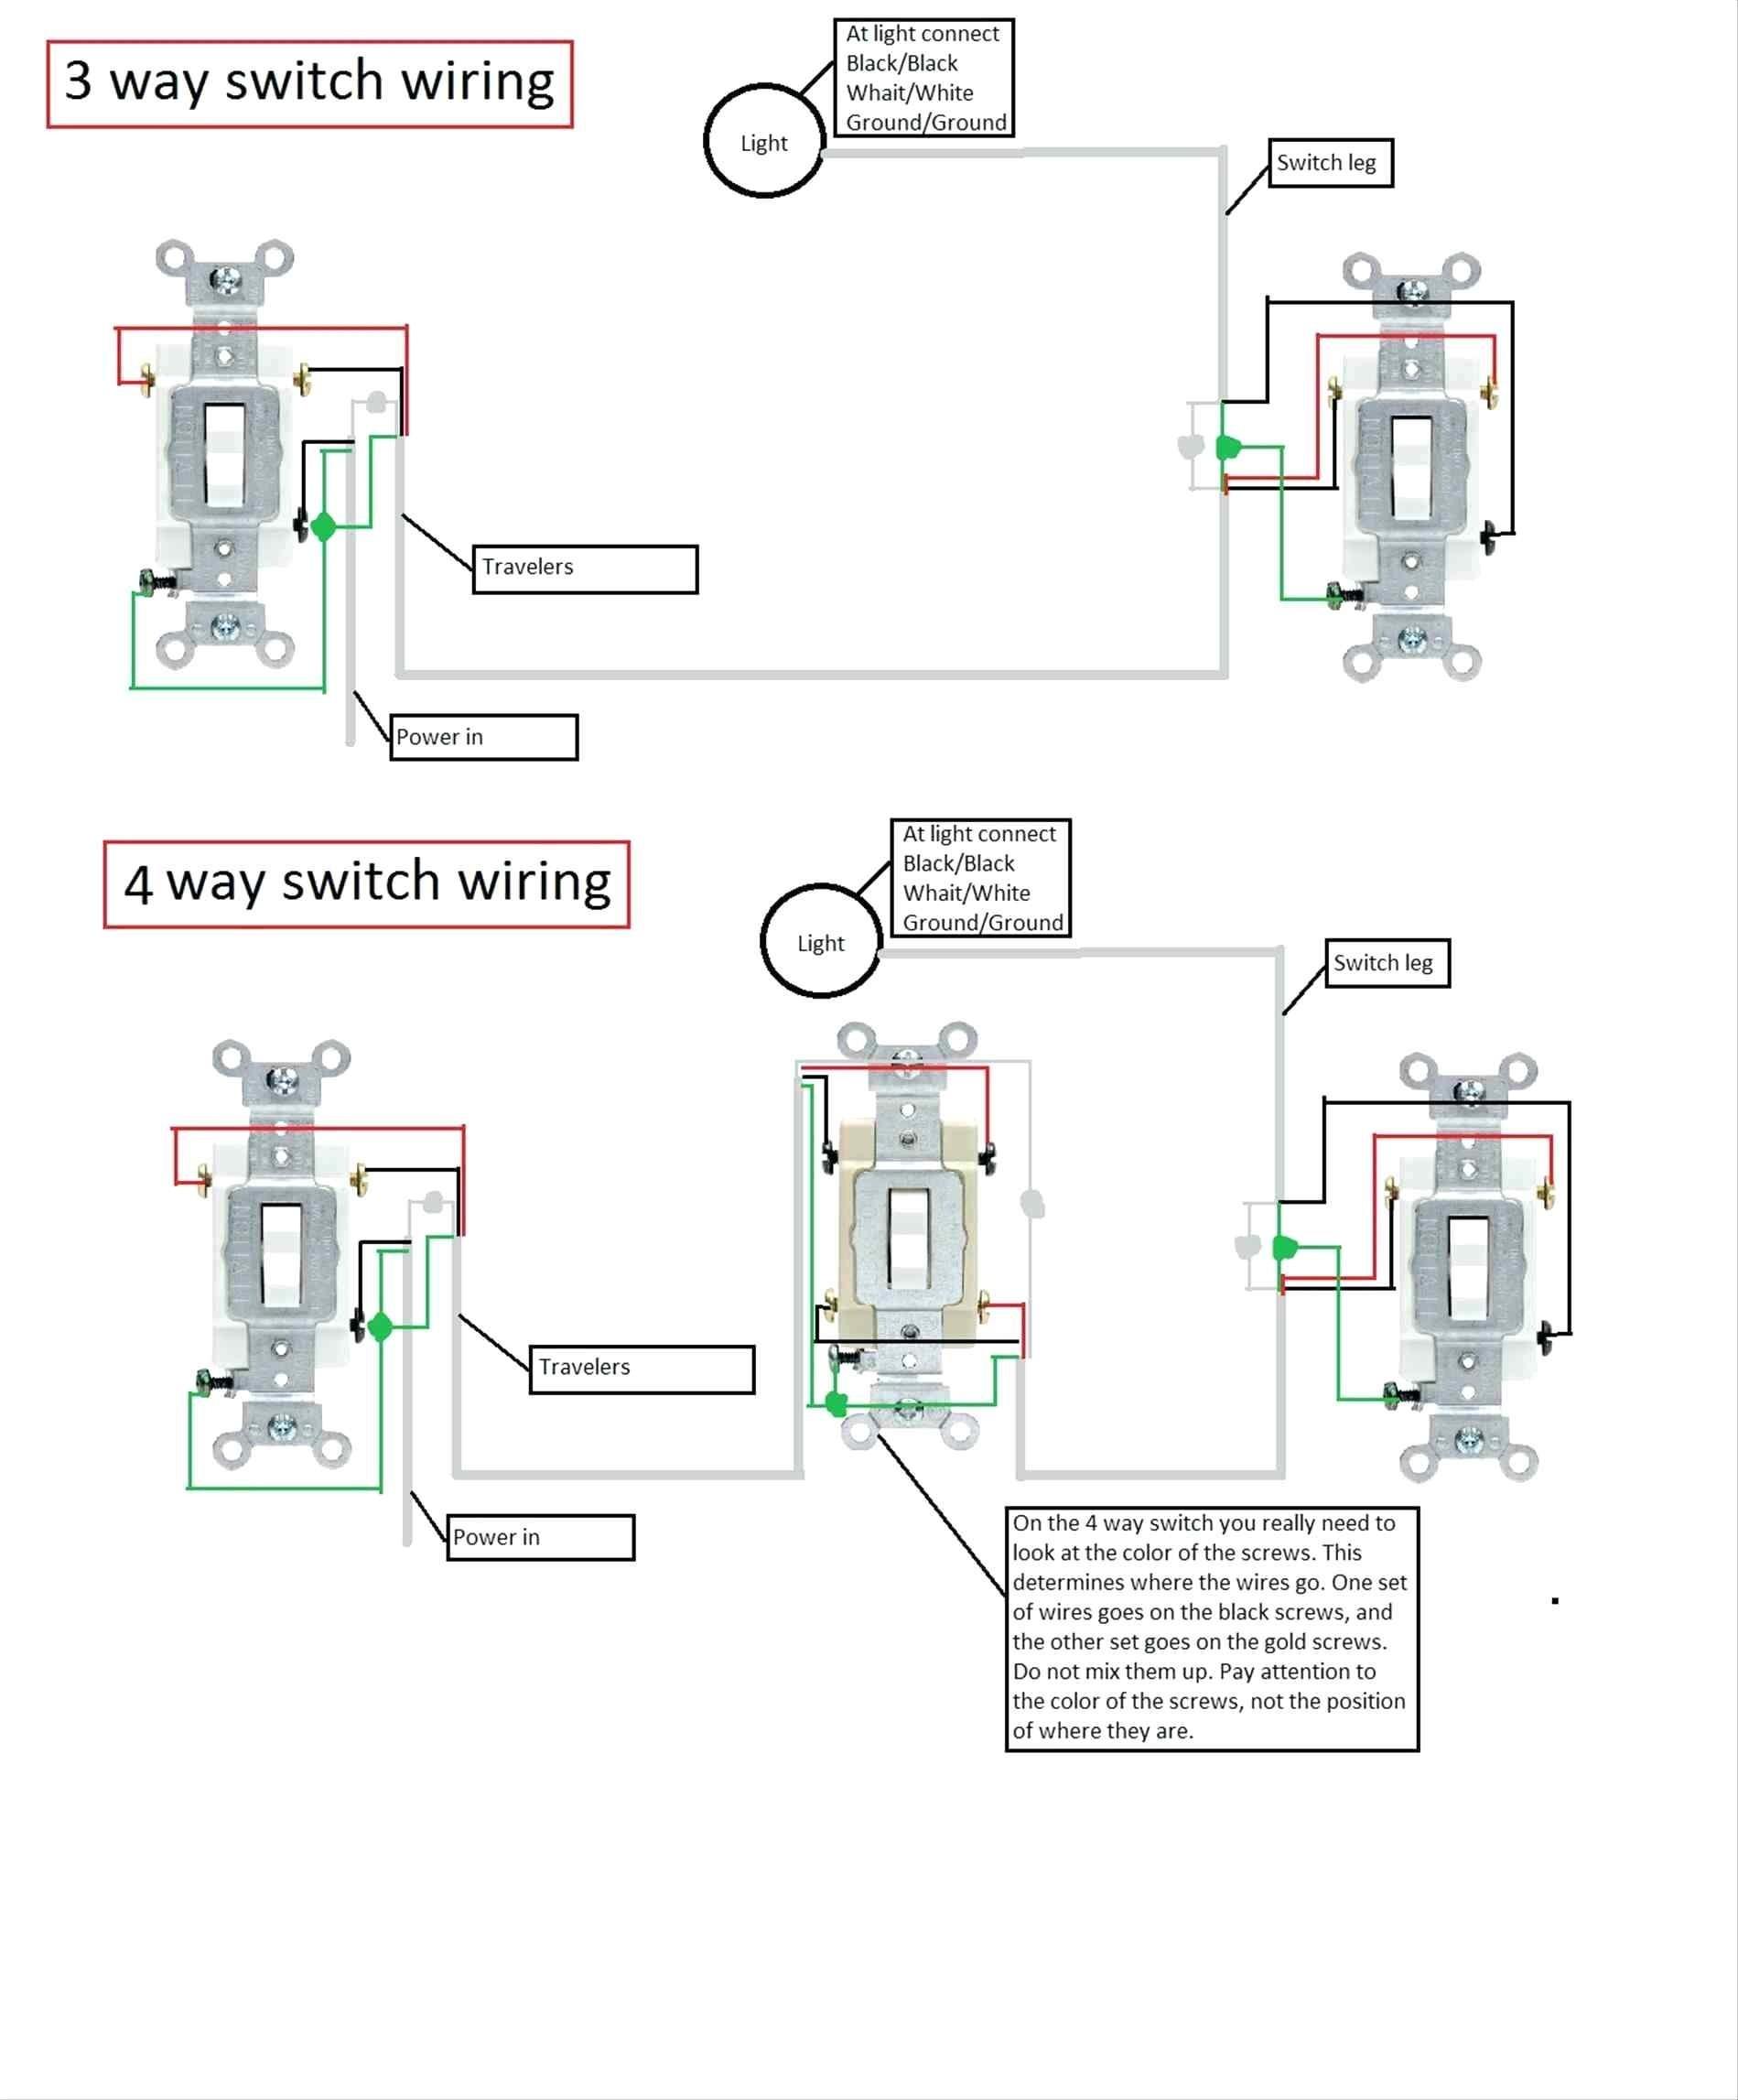 sprinkler wiring diagram also switch leg wiring diagram wiring